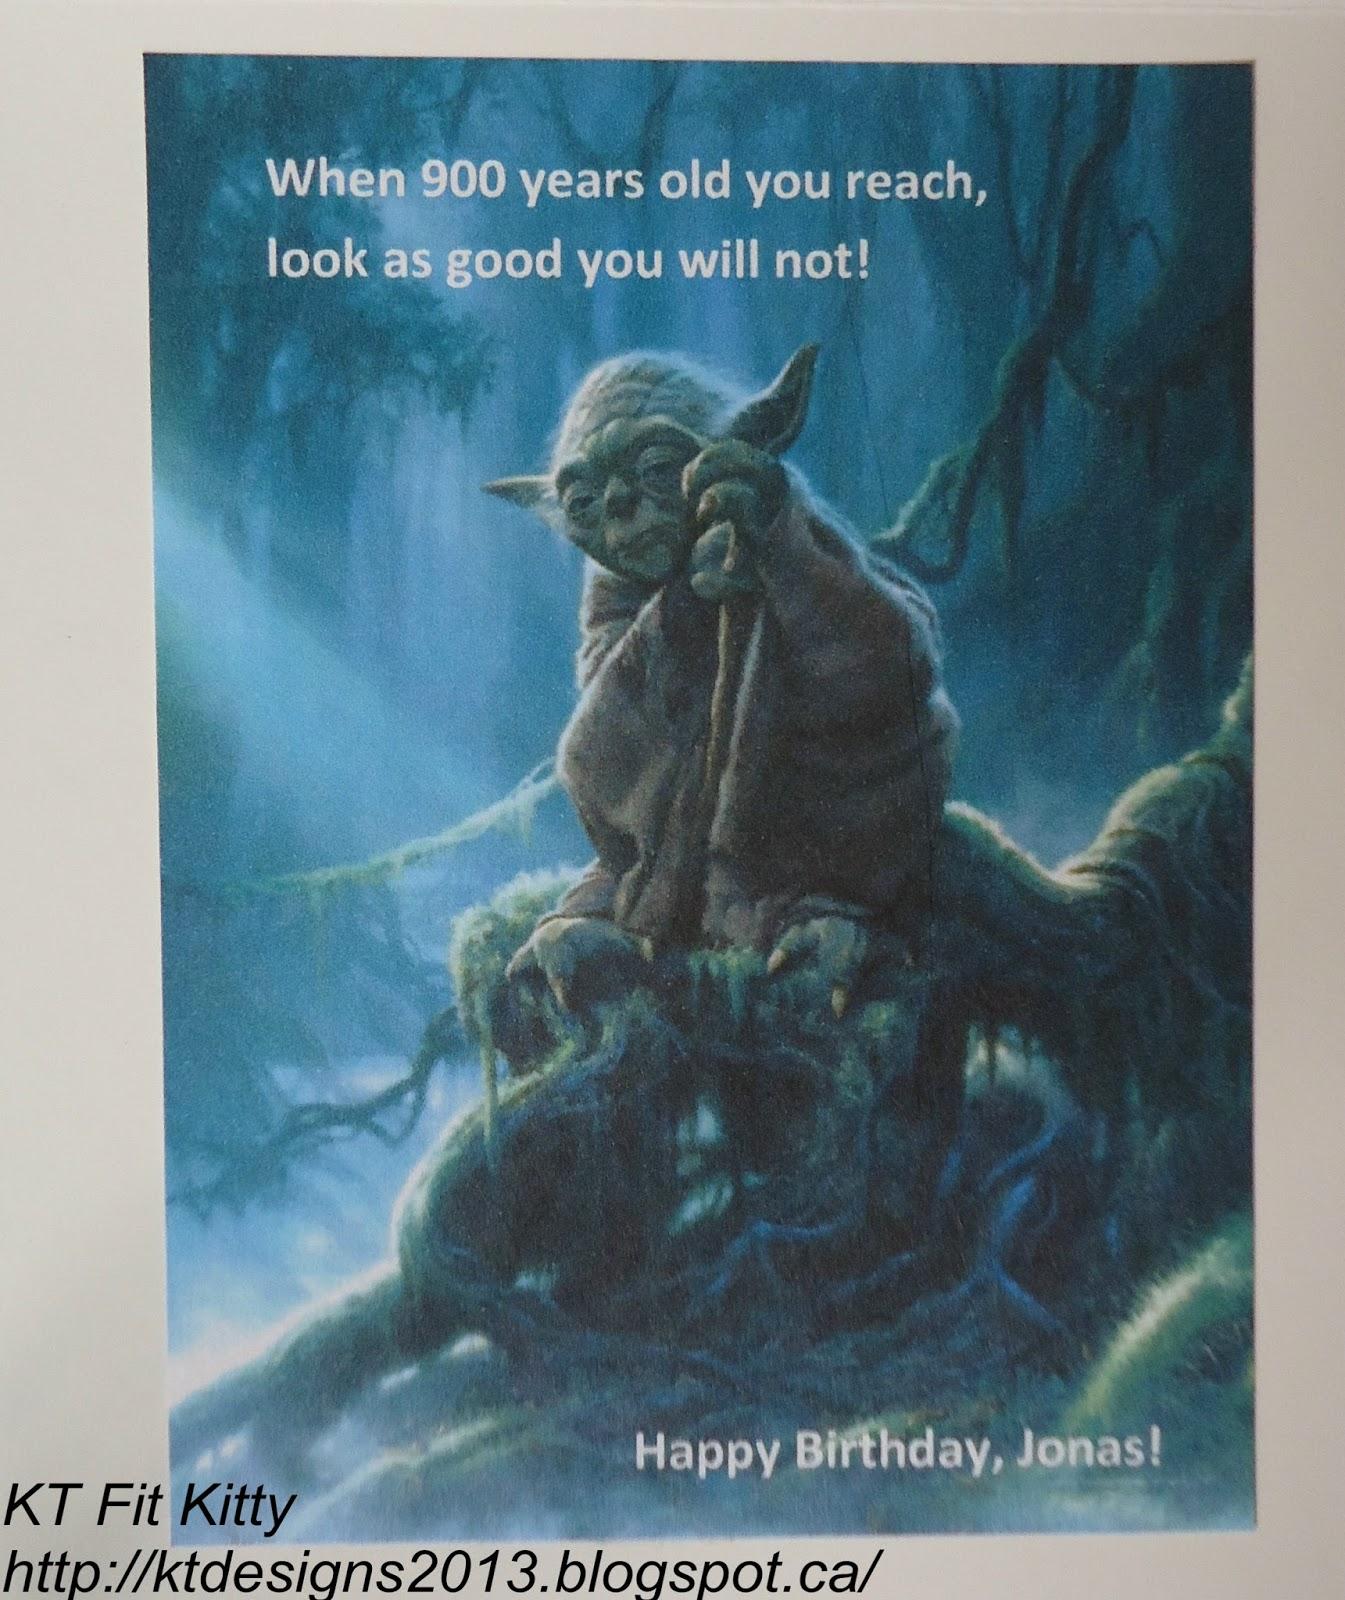 KT Fit Kitty: Yoda Birthday Card (for Jonas